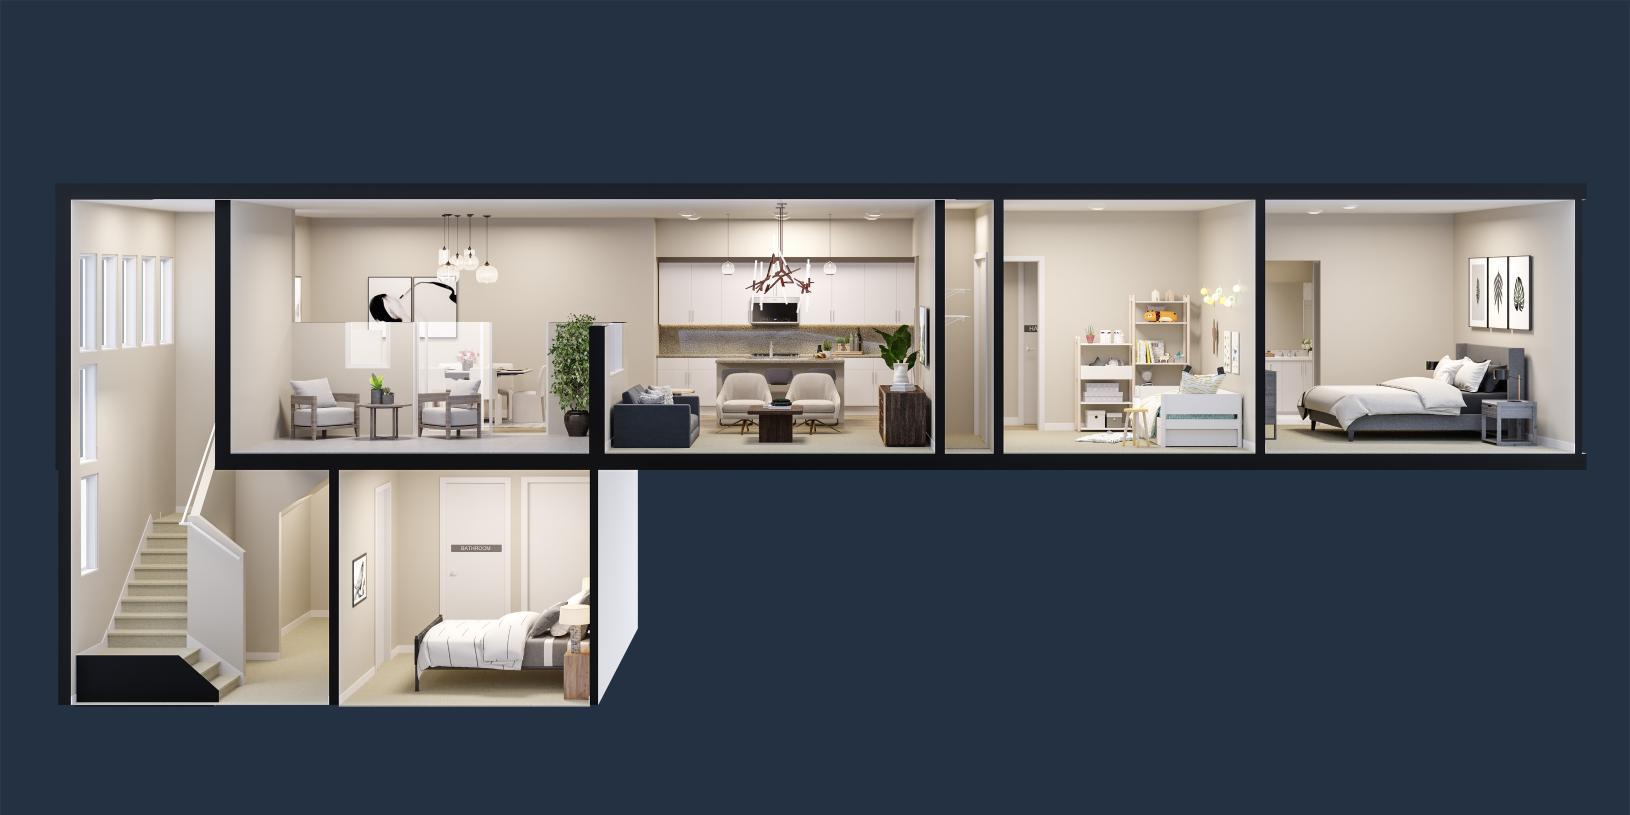 Lofts Plan 2, virtually designed for demonstration